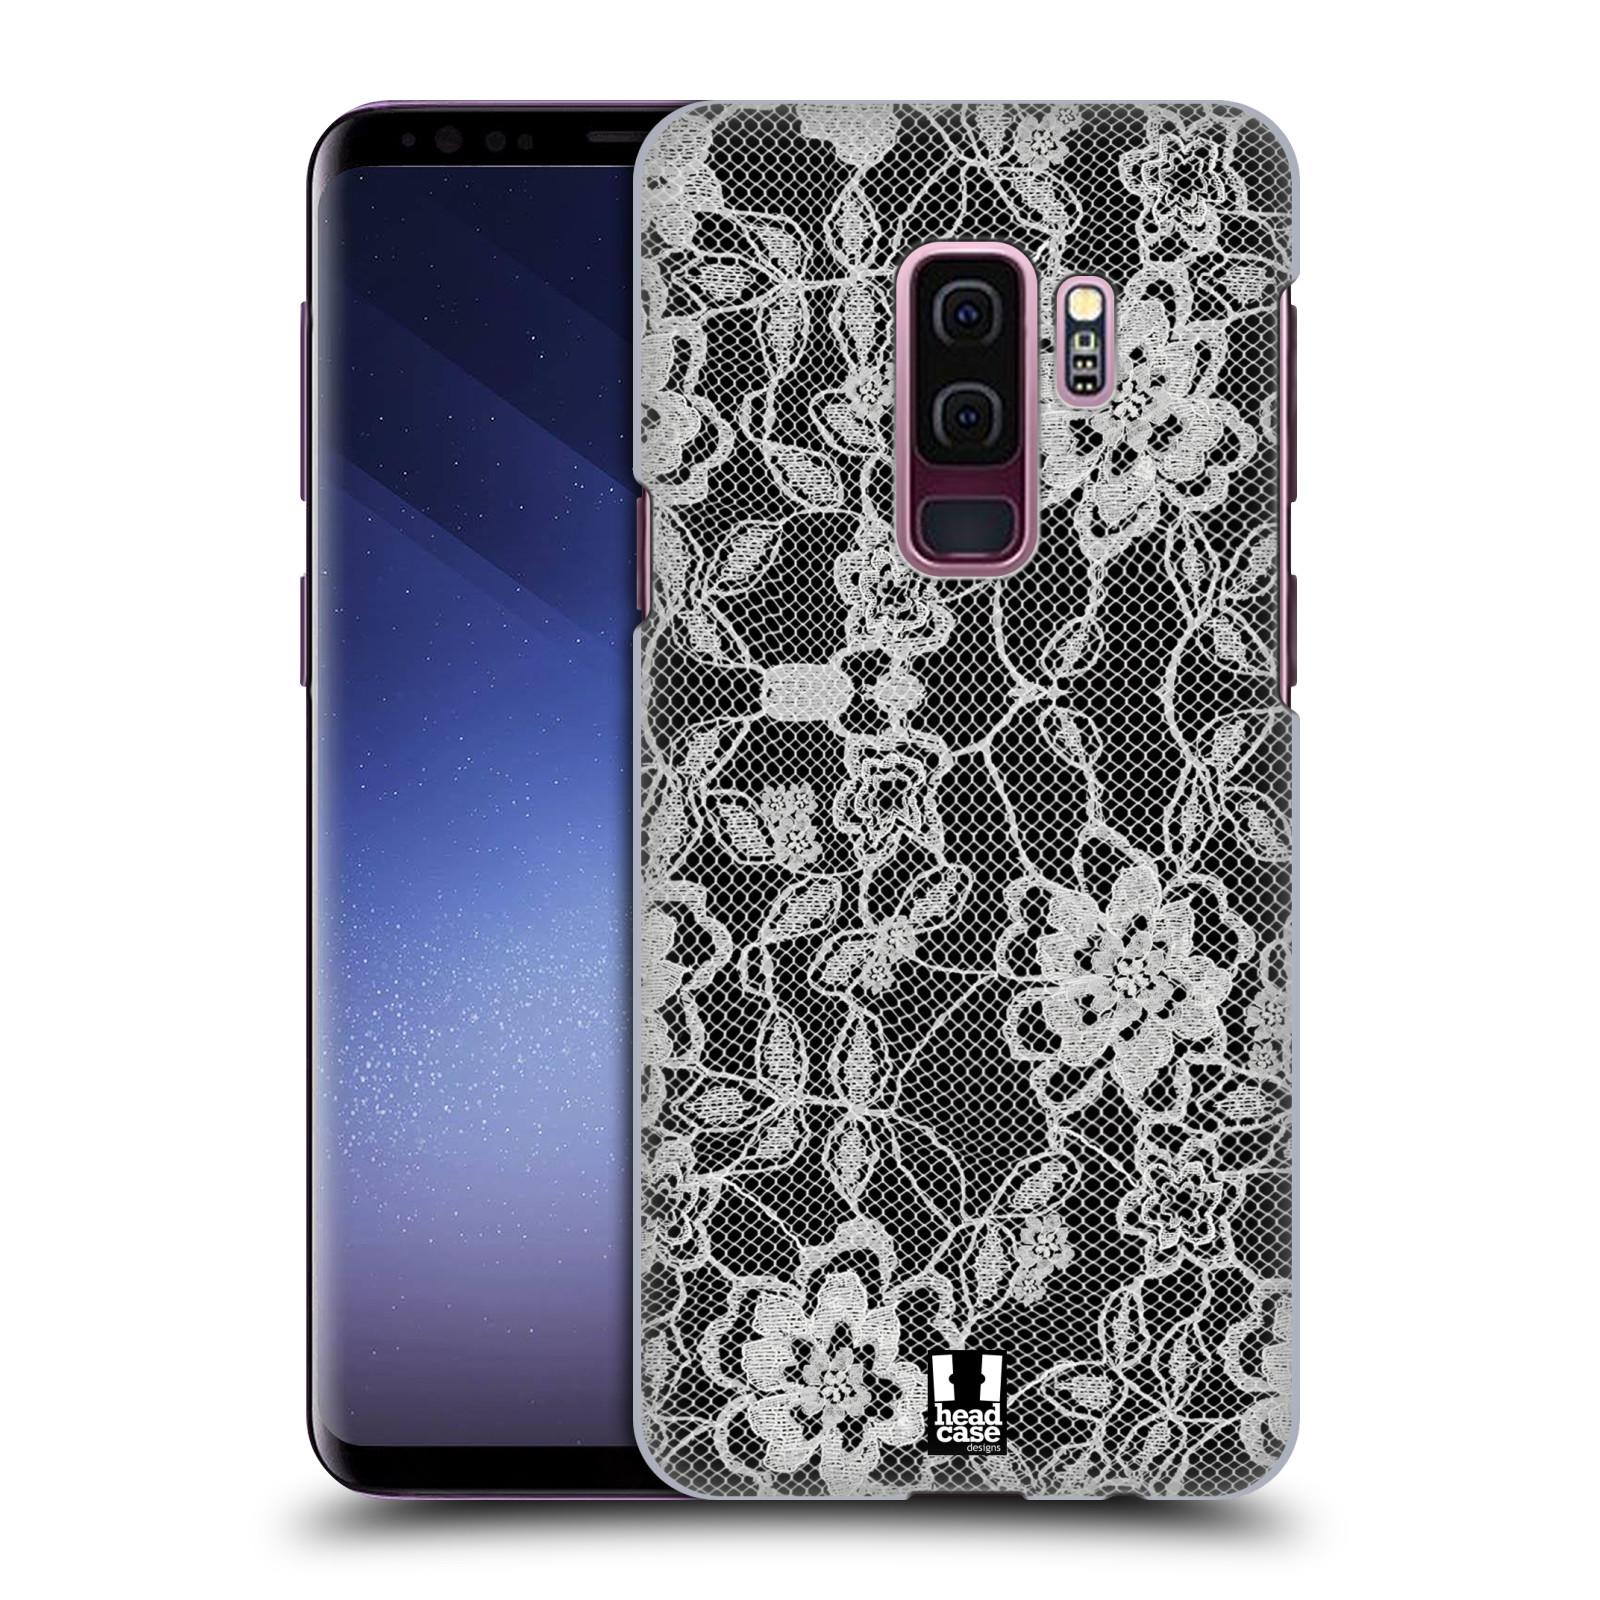 Plastové pouzdro na mobil Samsung Galaxy S9 Plus - Head Case - FLOWERY KRAJKA